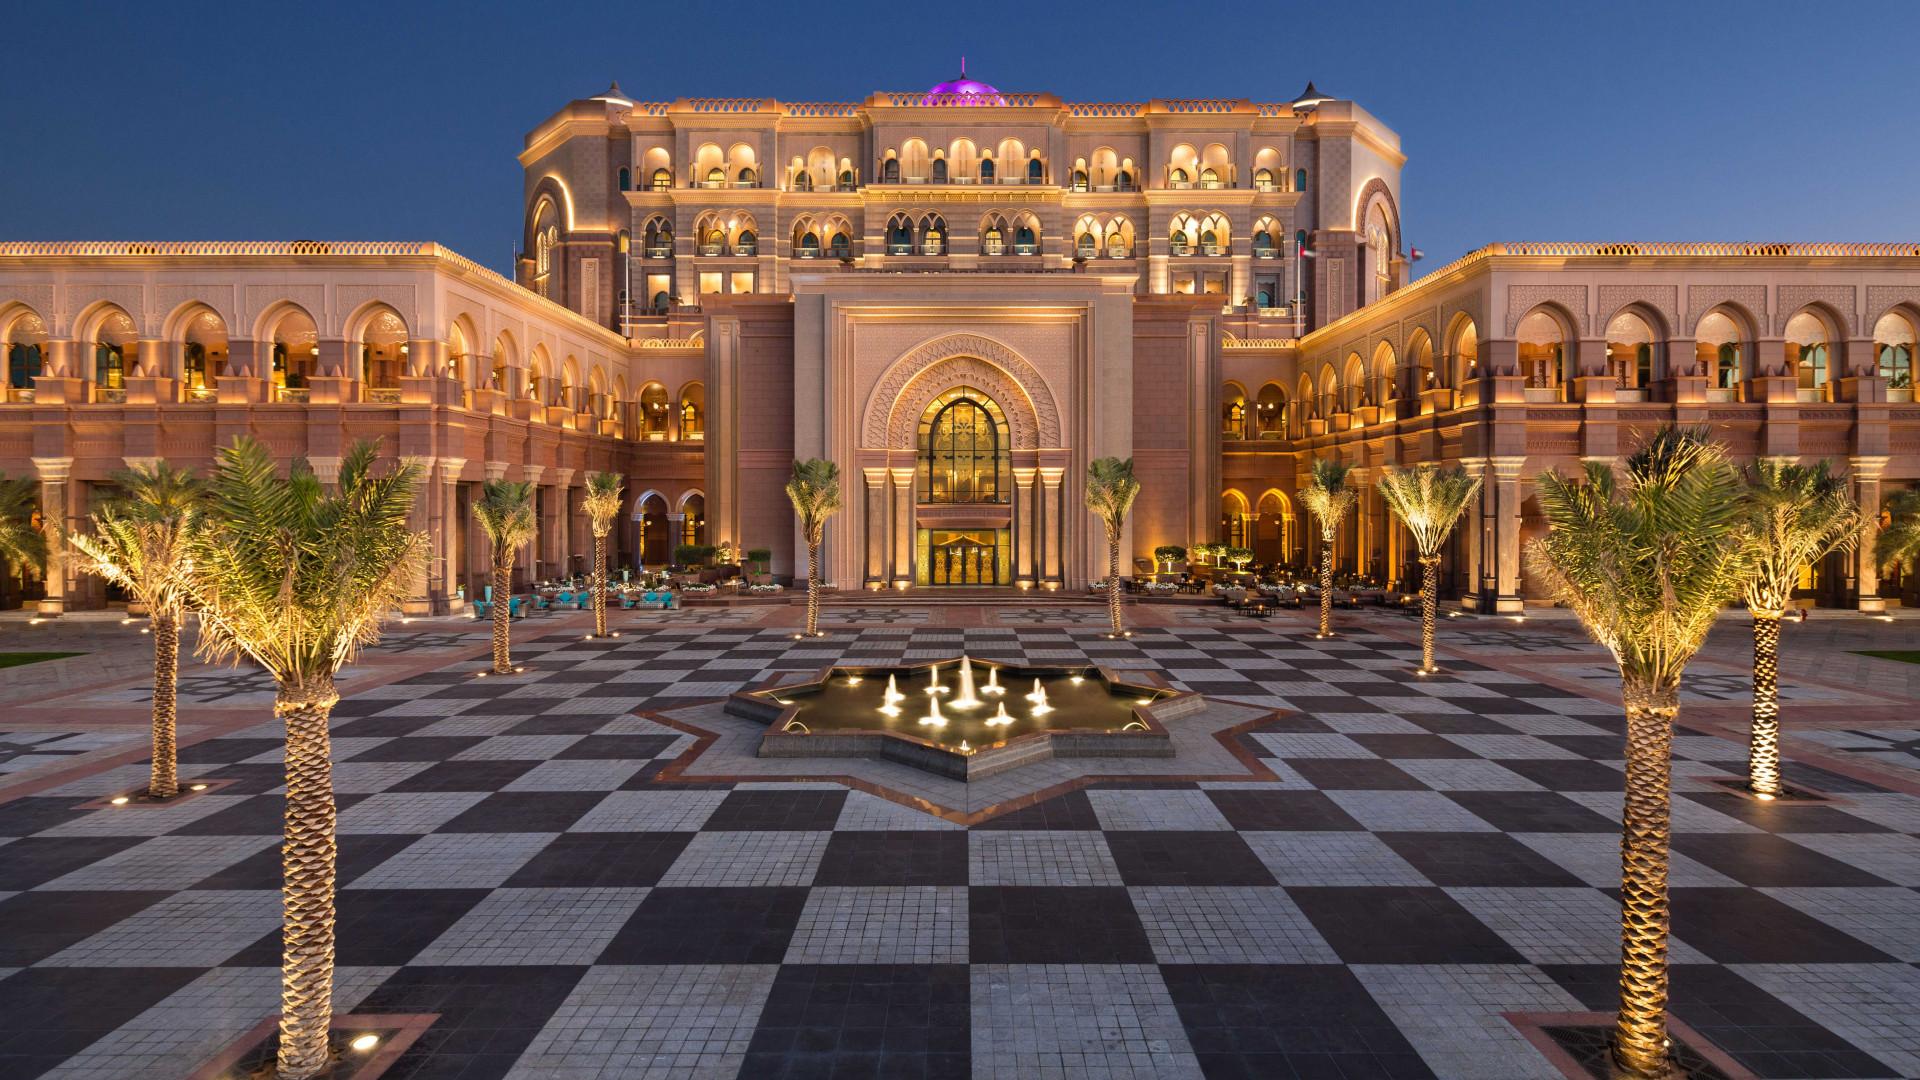 Courtyard at Kempinski Emirates Palace in Abu Dhabi